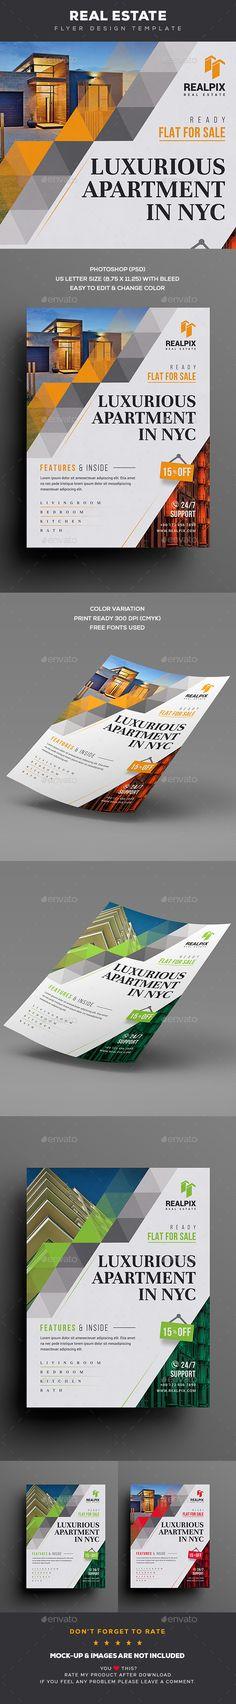 #Real #Estate #Flyer - Commerce Flyers Download here: https://graphicriver.net/item/real-estate-flyer/20441245?ref=alena994